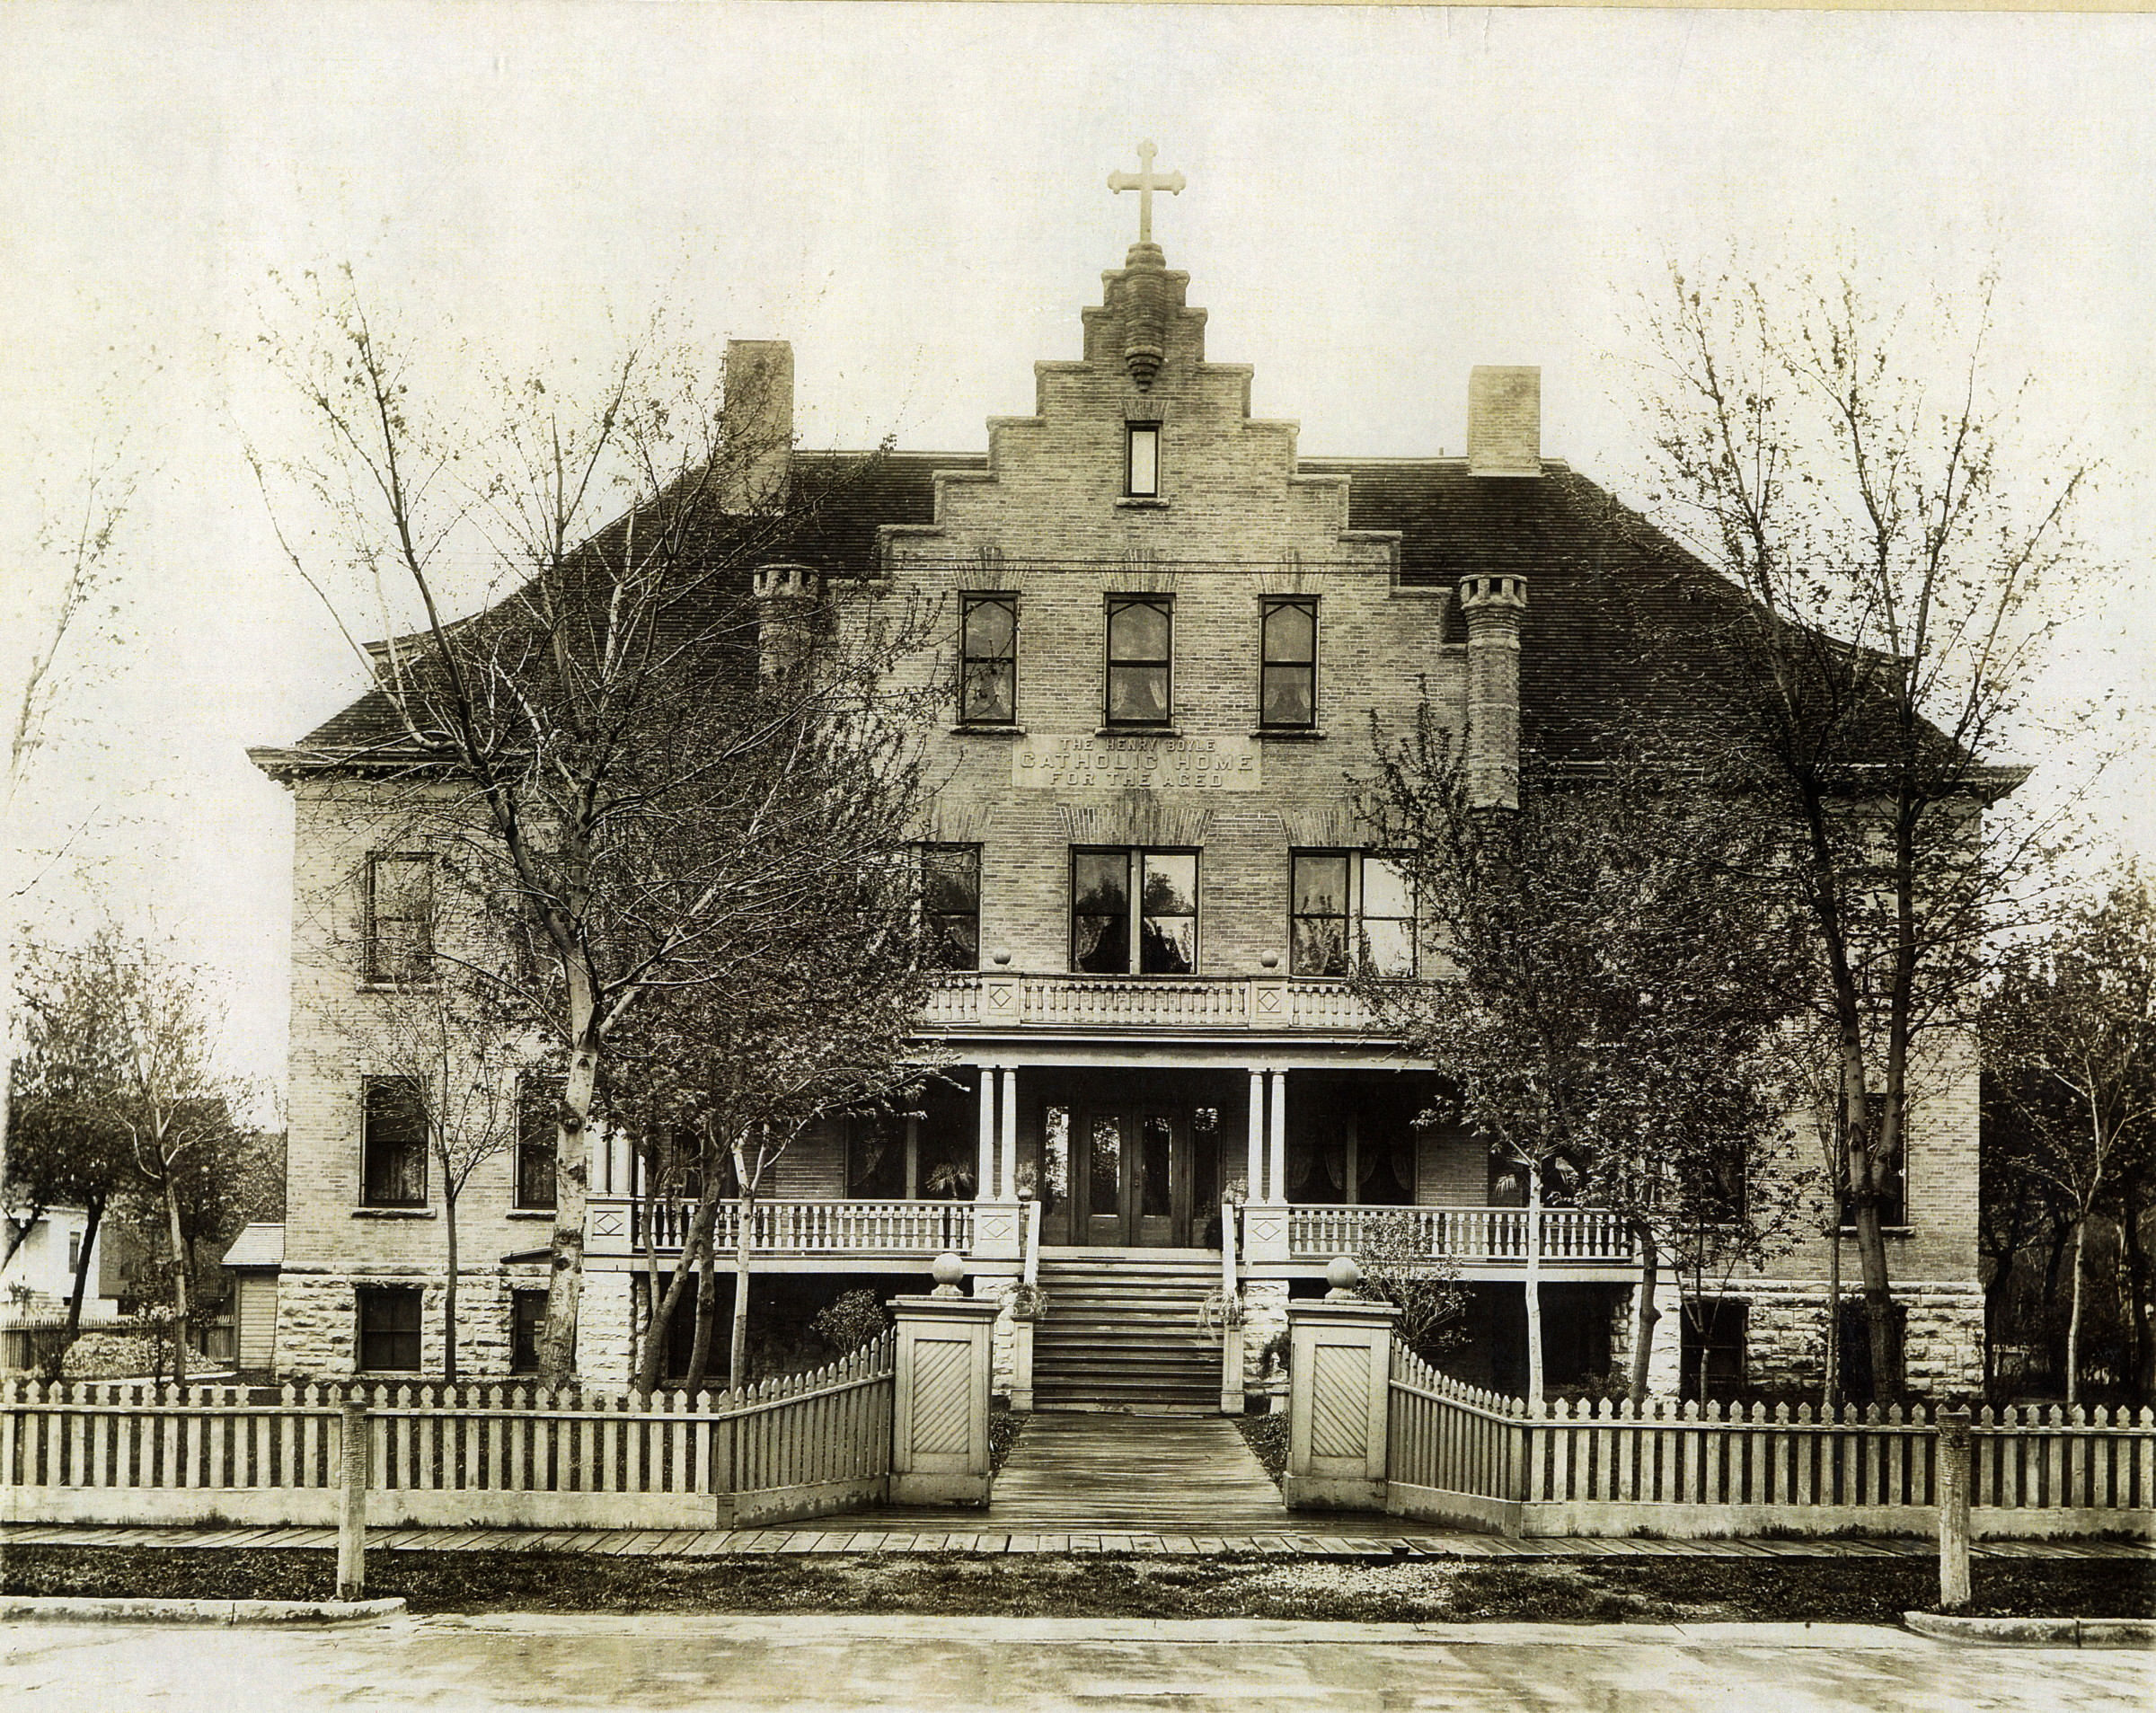 Henry Boyle Catholic Home for the Aged, c. 1910s